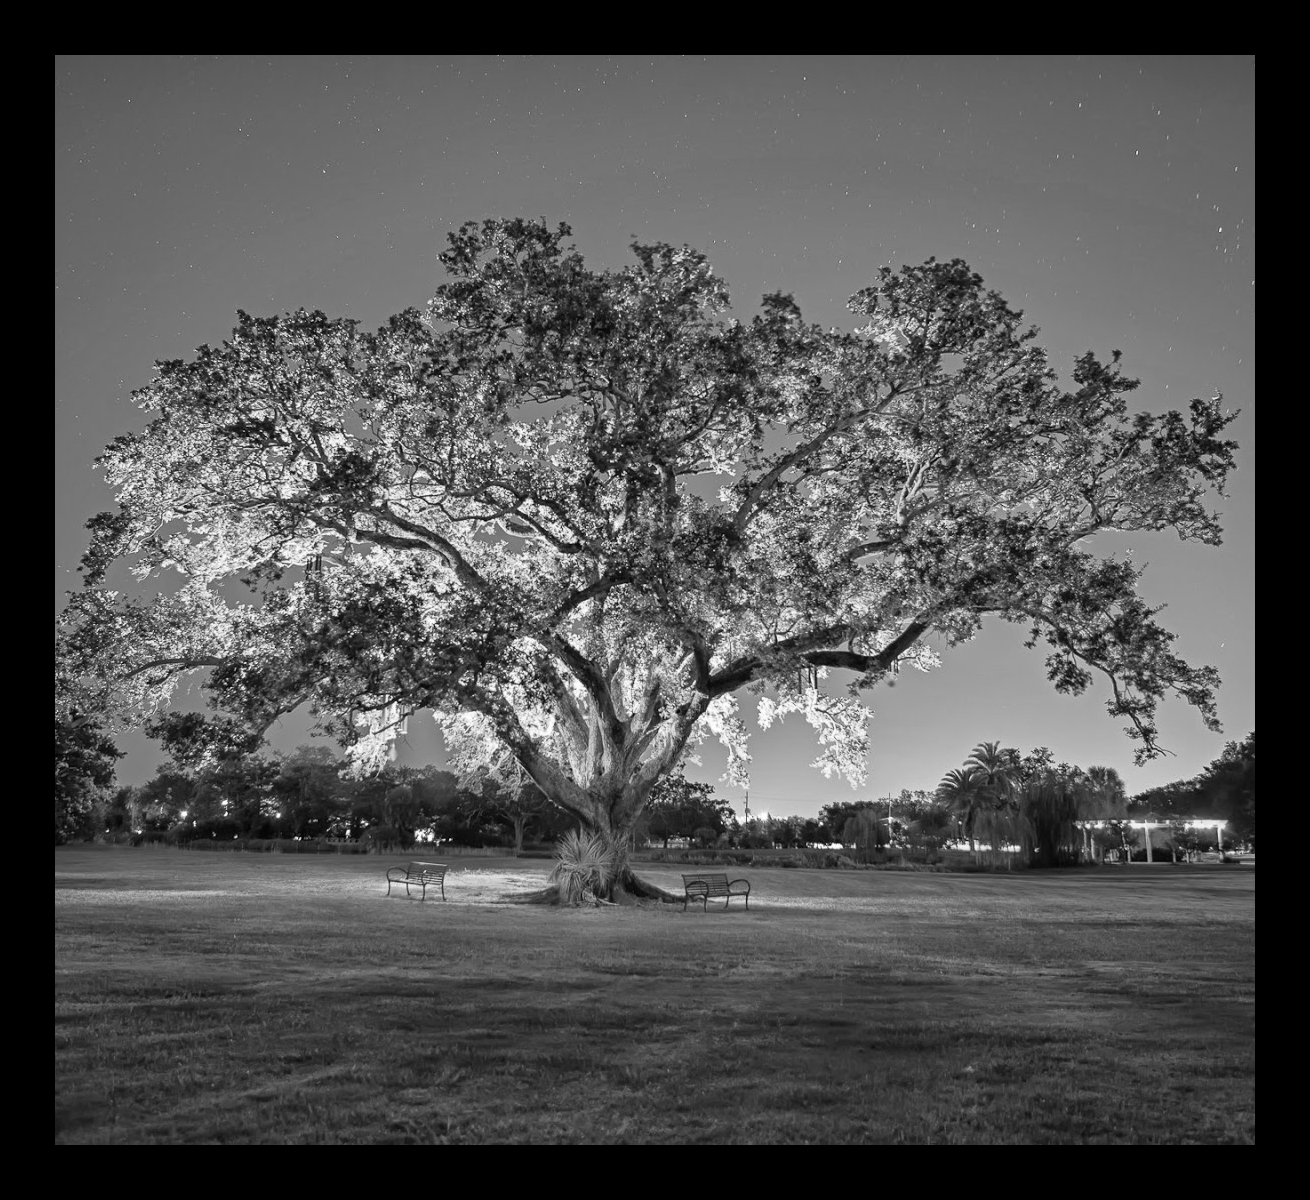 Tree_Of_Life_Small.jpg